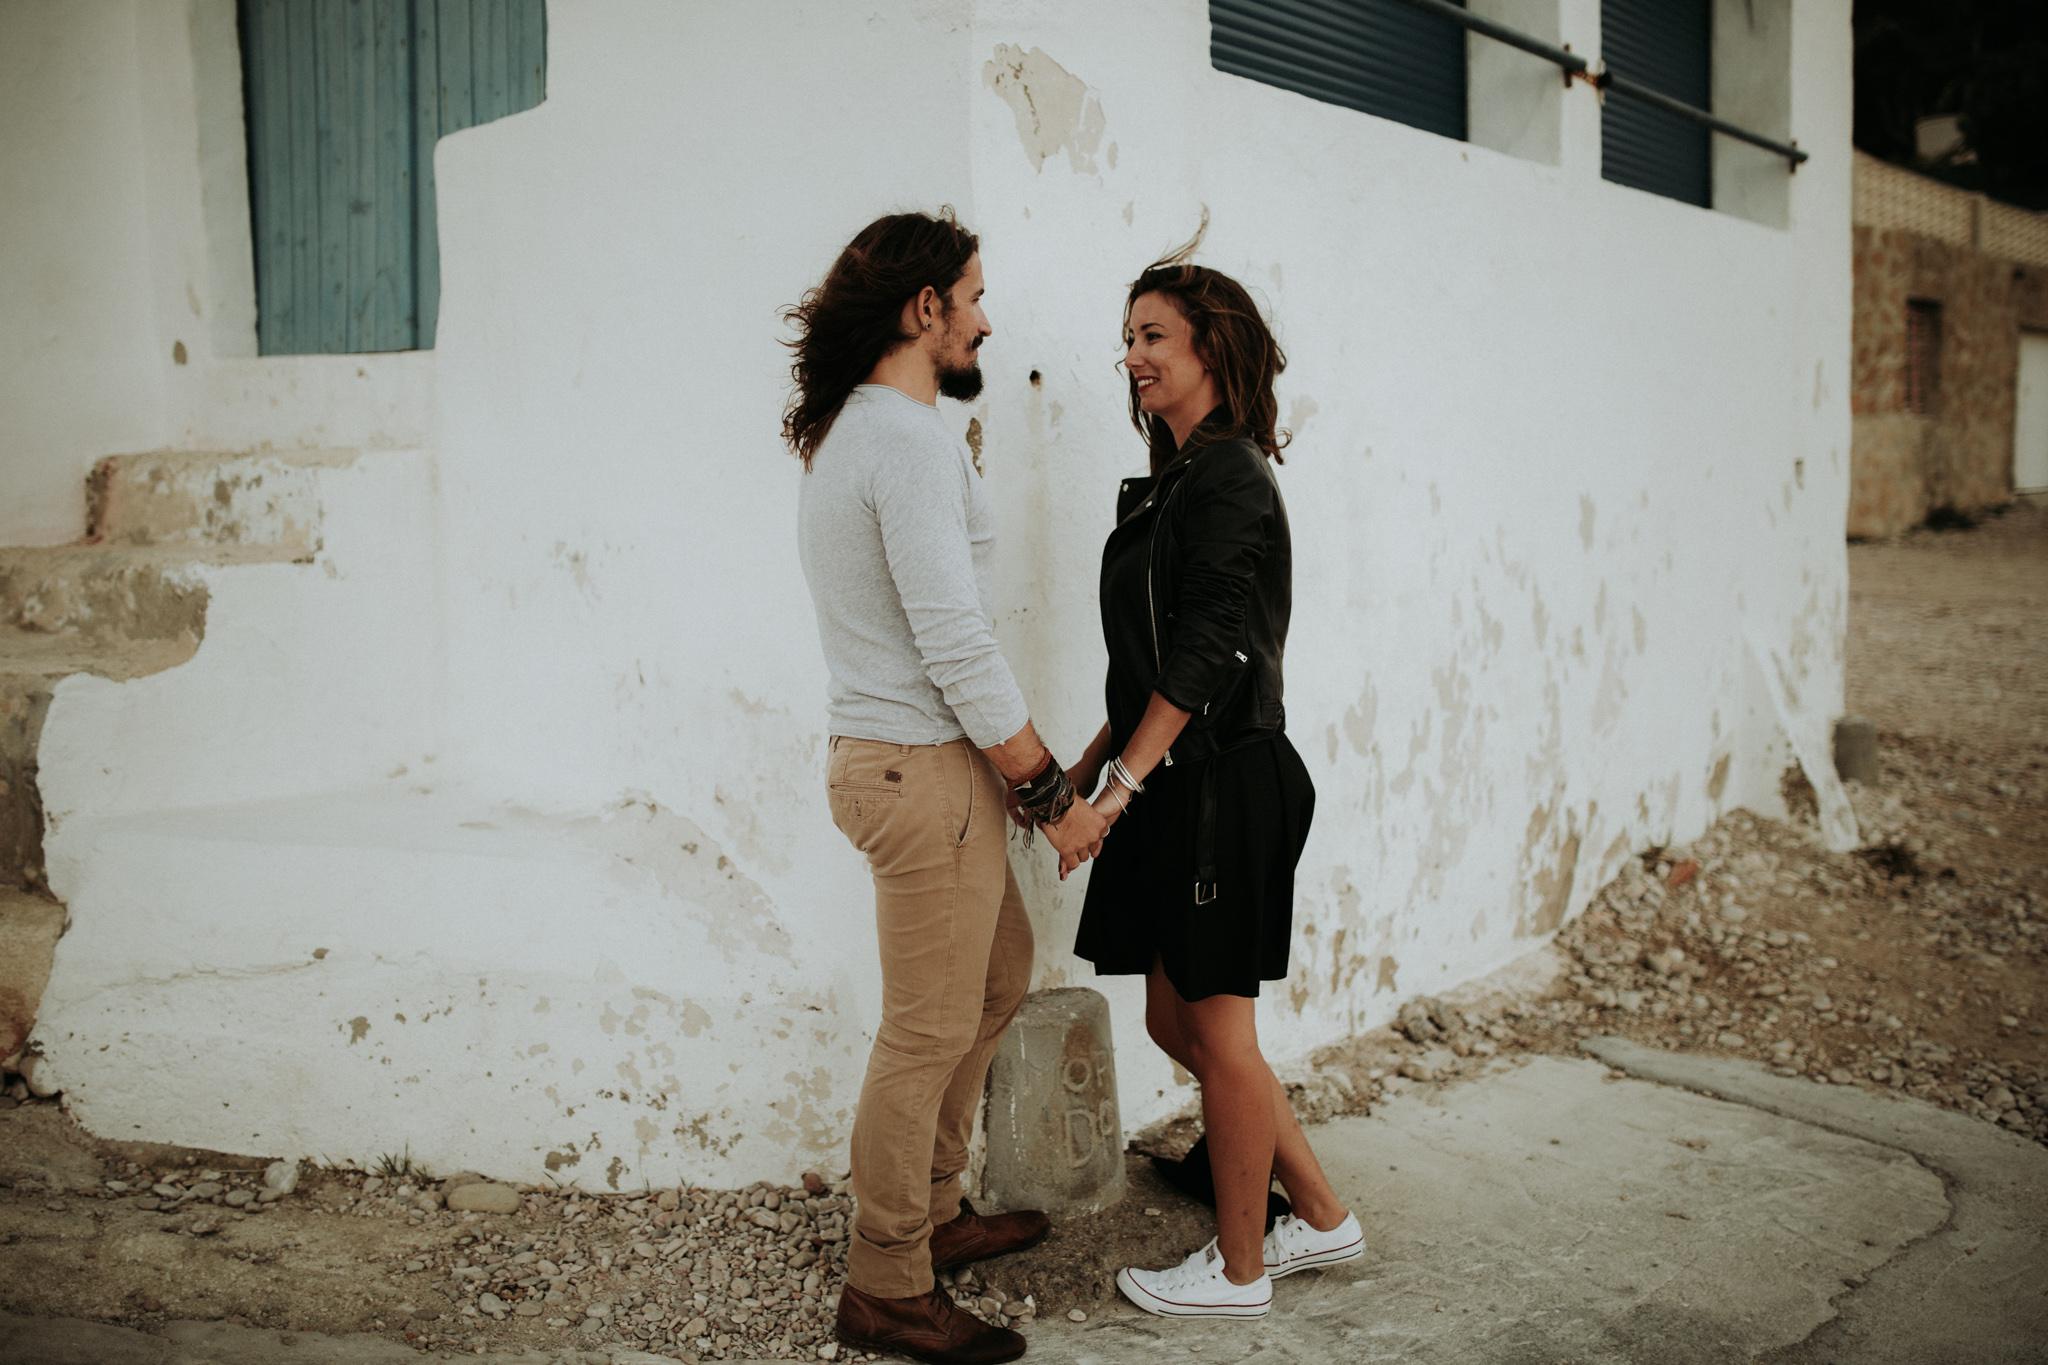 Olga+y+Carmelo+baja-92.jpg